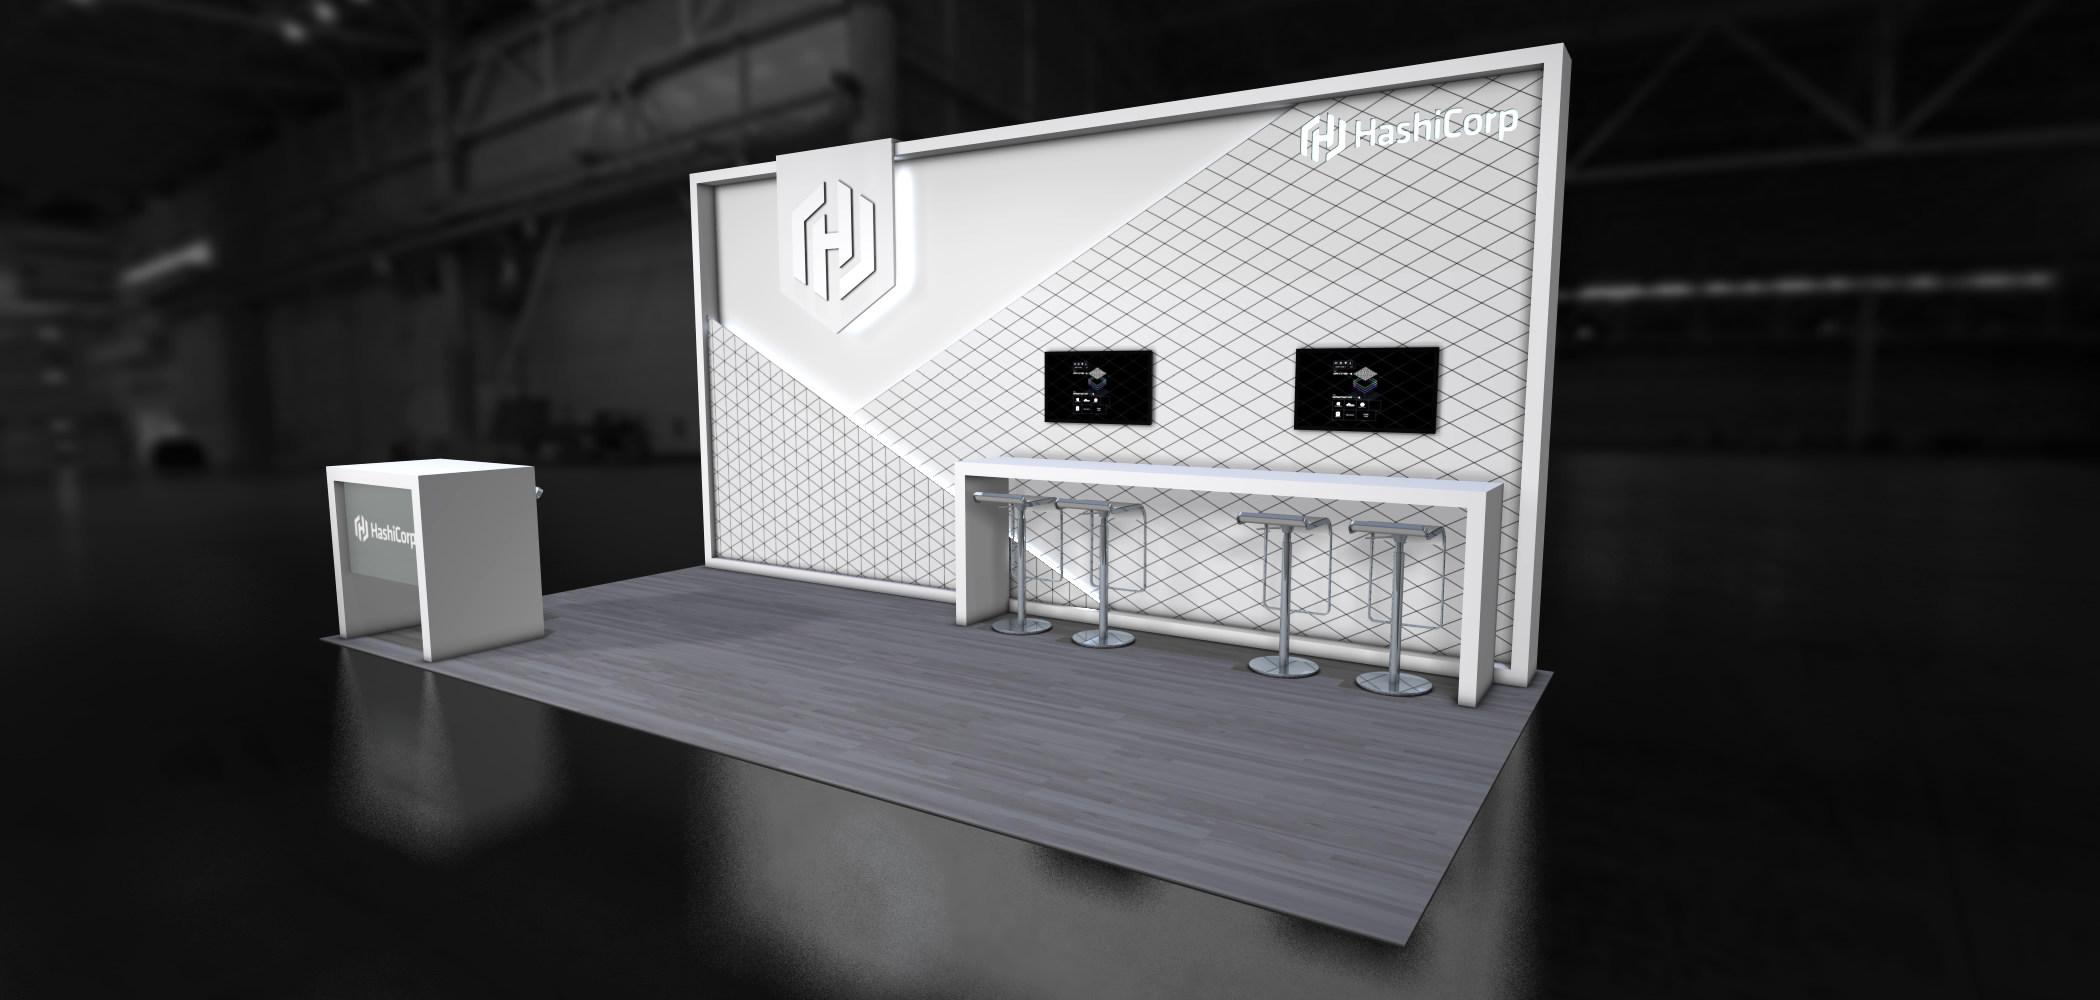 HashiCorp-AWSRI-2018-10x20-Concept3.0-FR